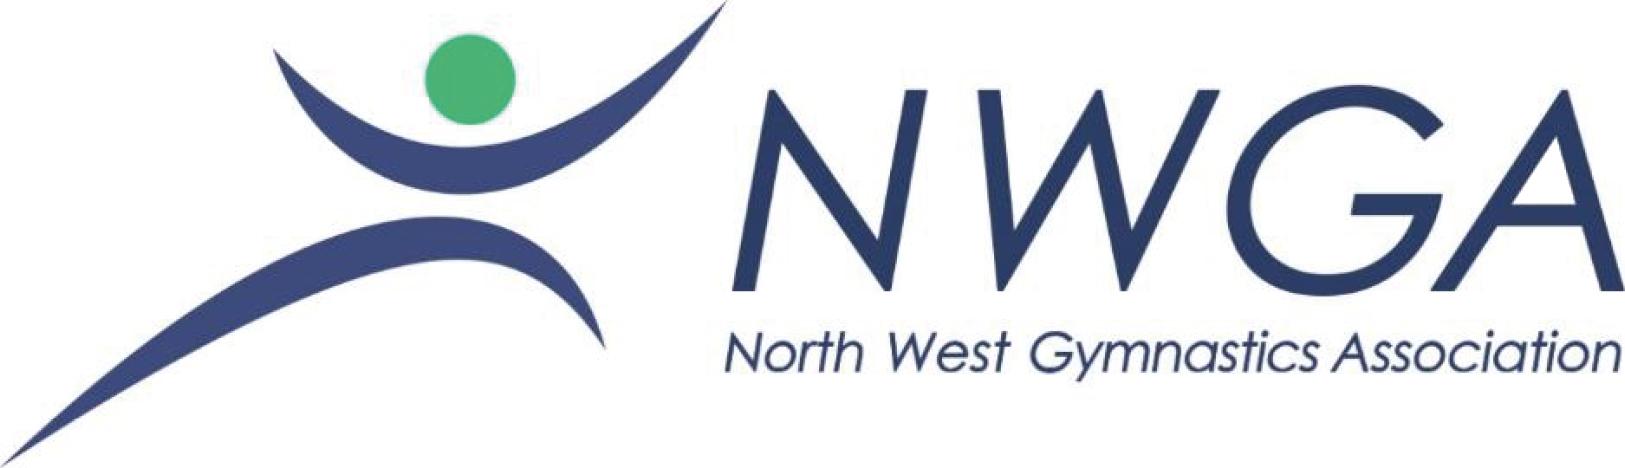 North West Gymnastics Association